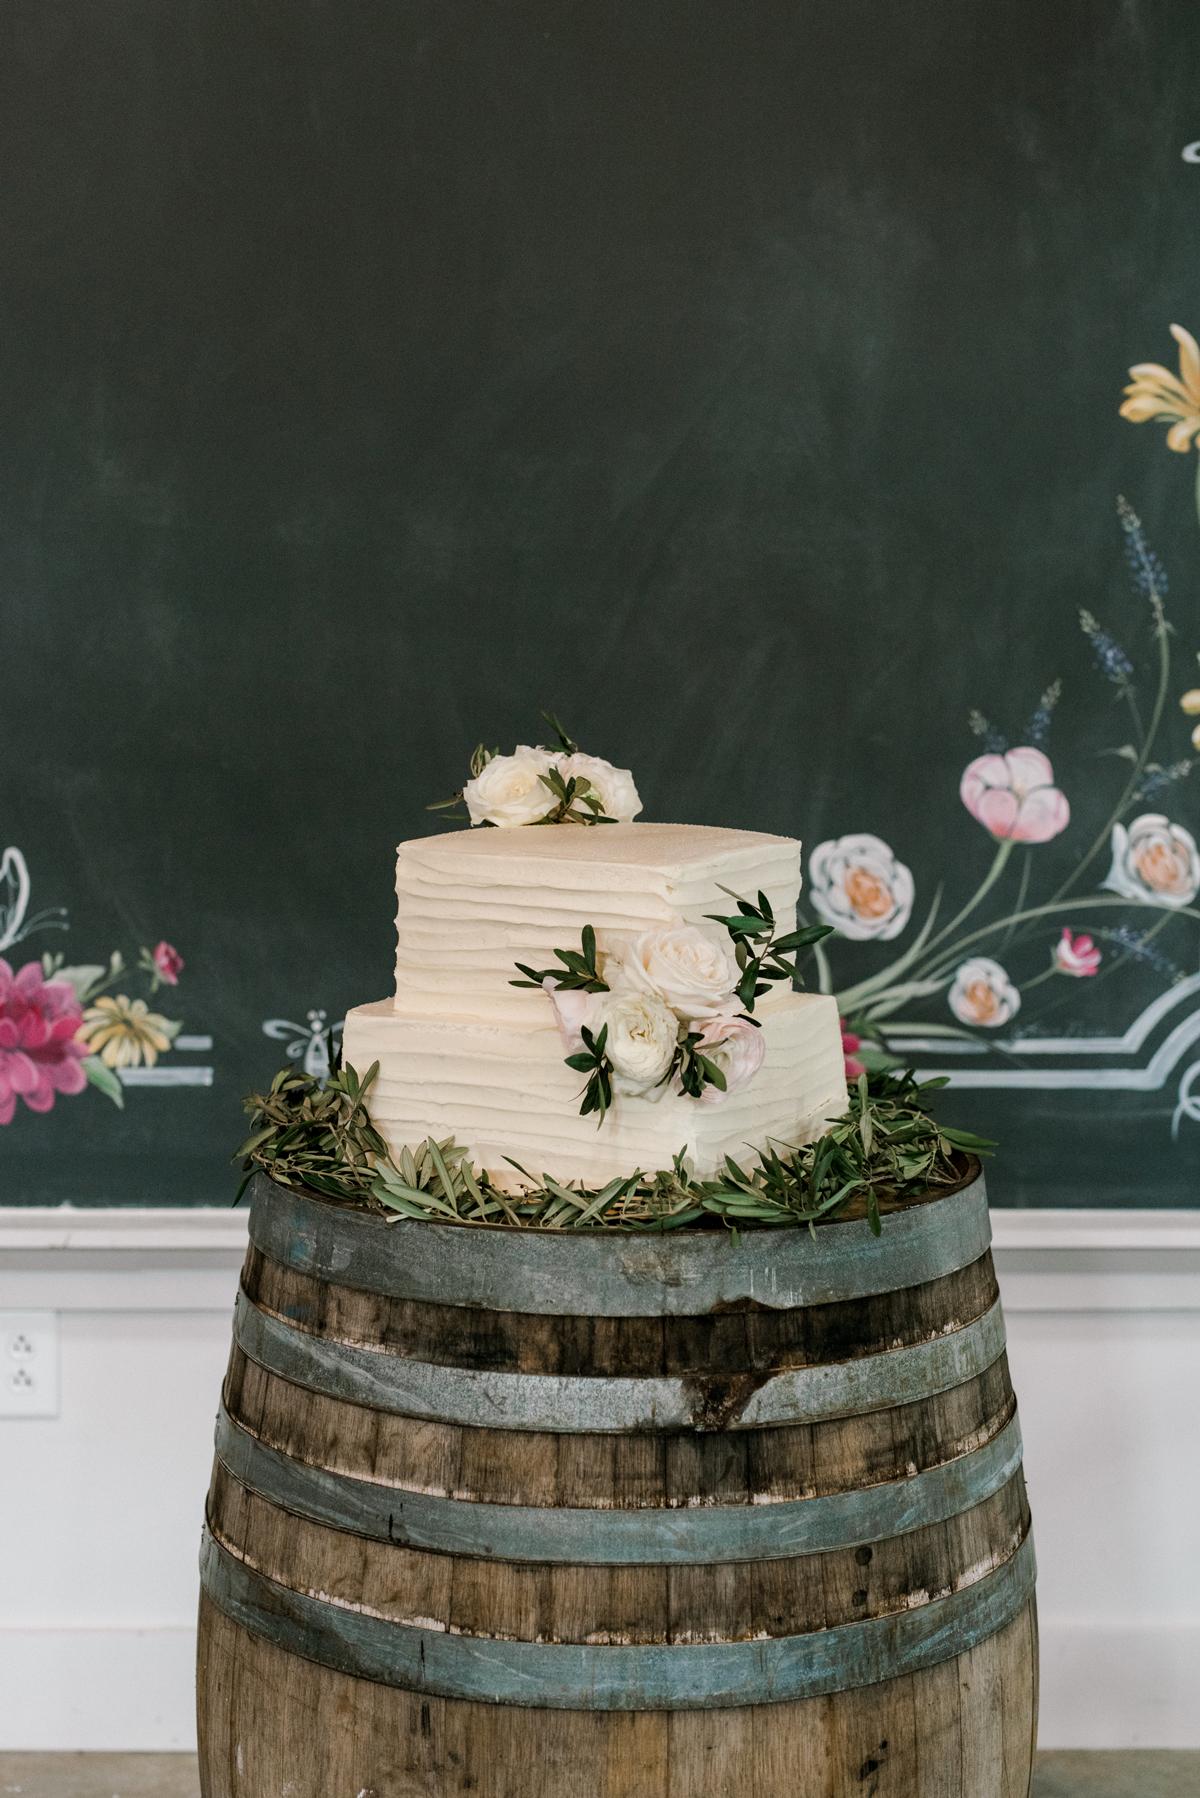 paige and kristine wedding cake